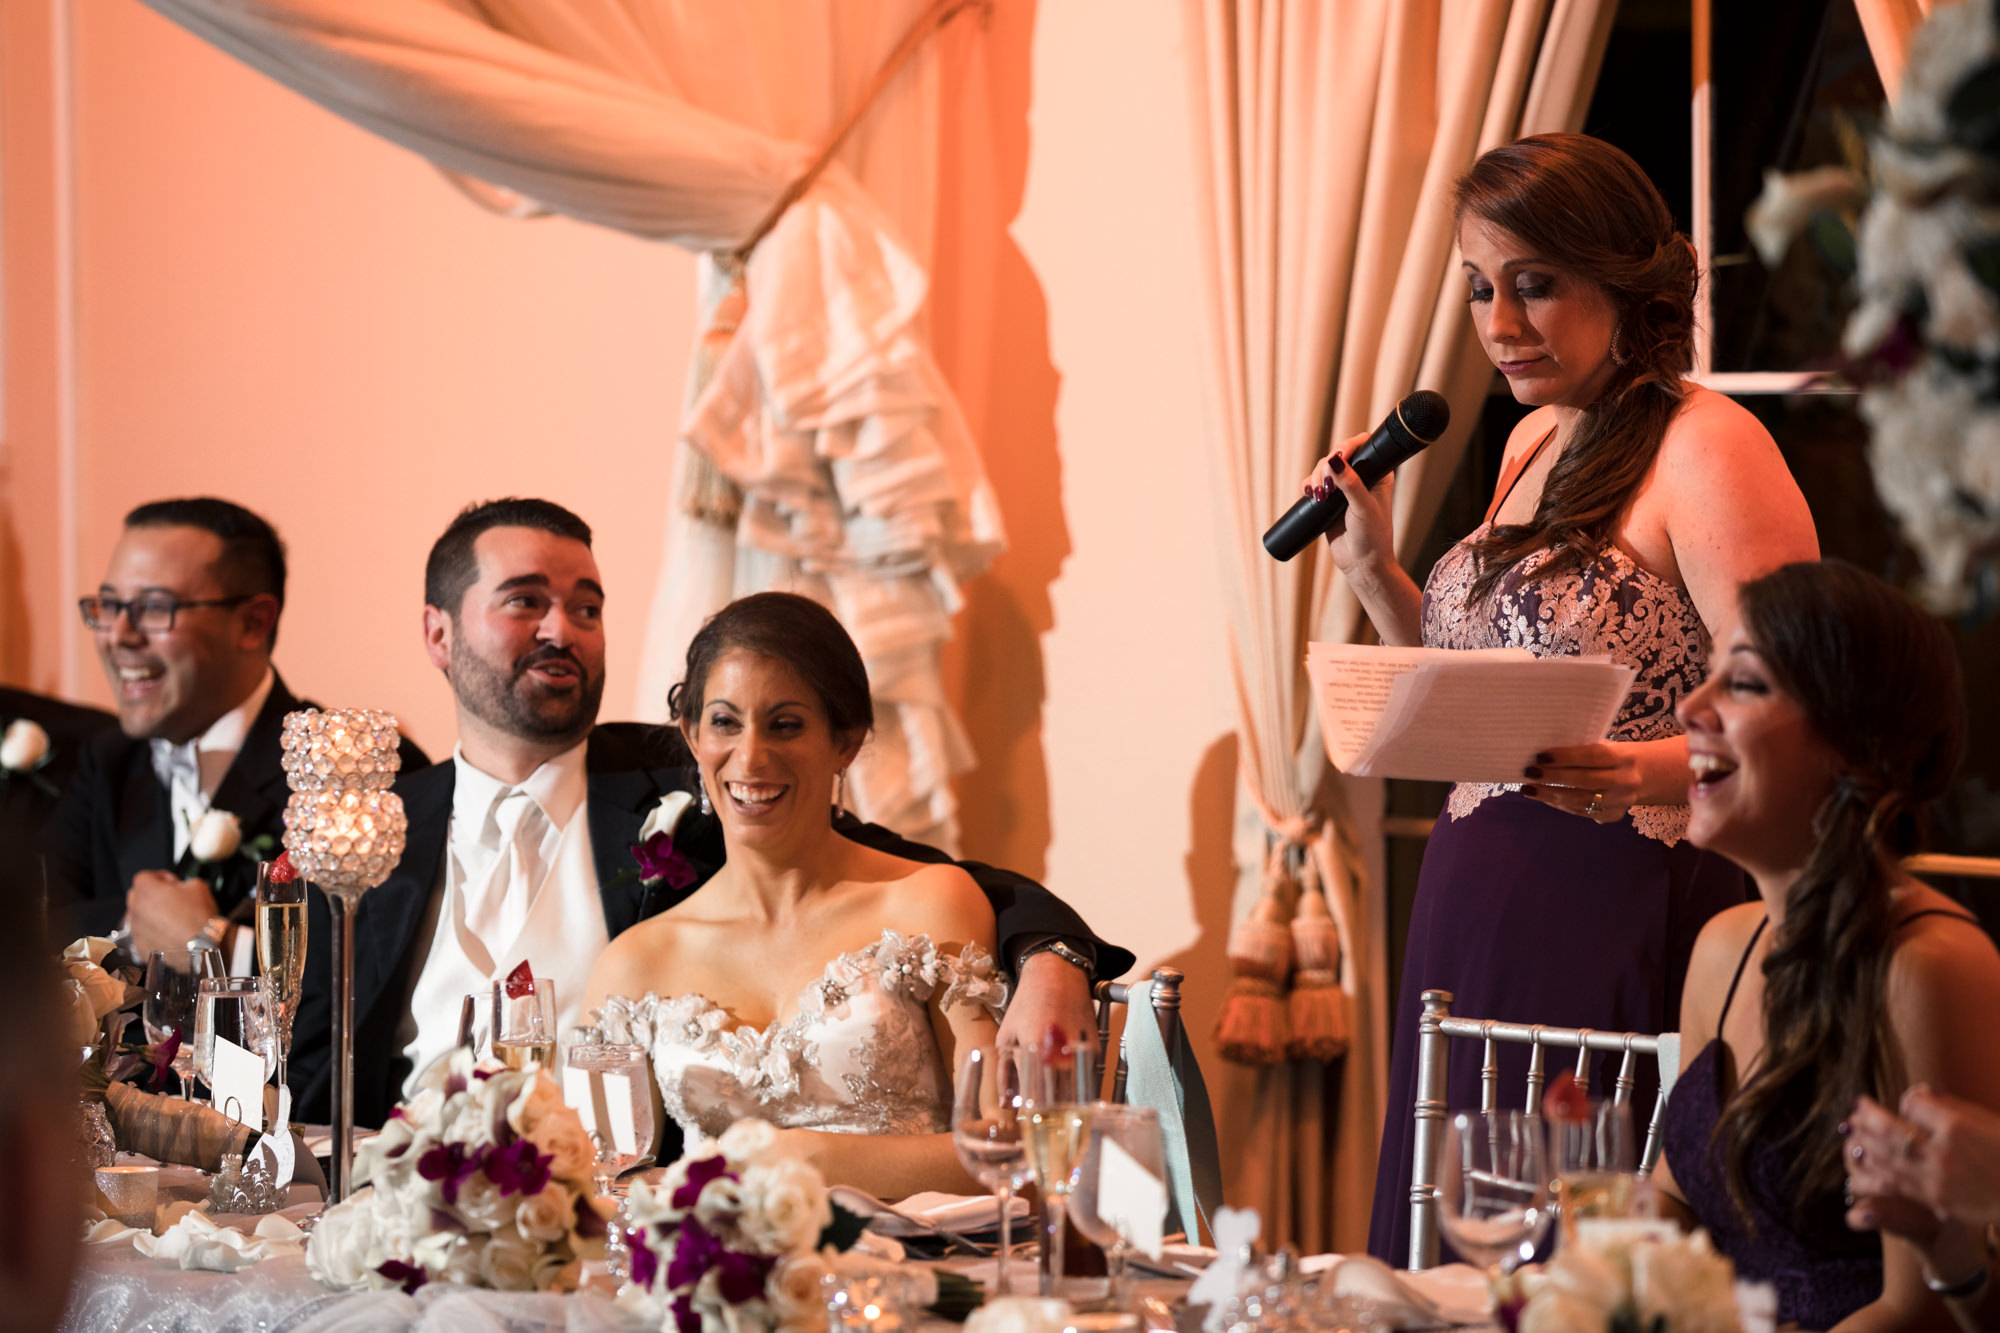 Benvenuto_Wedding_catholic_Florida_Bride-Groom-113.jpg